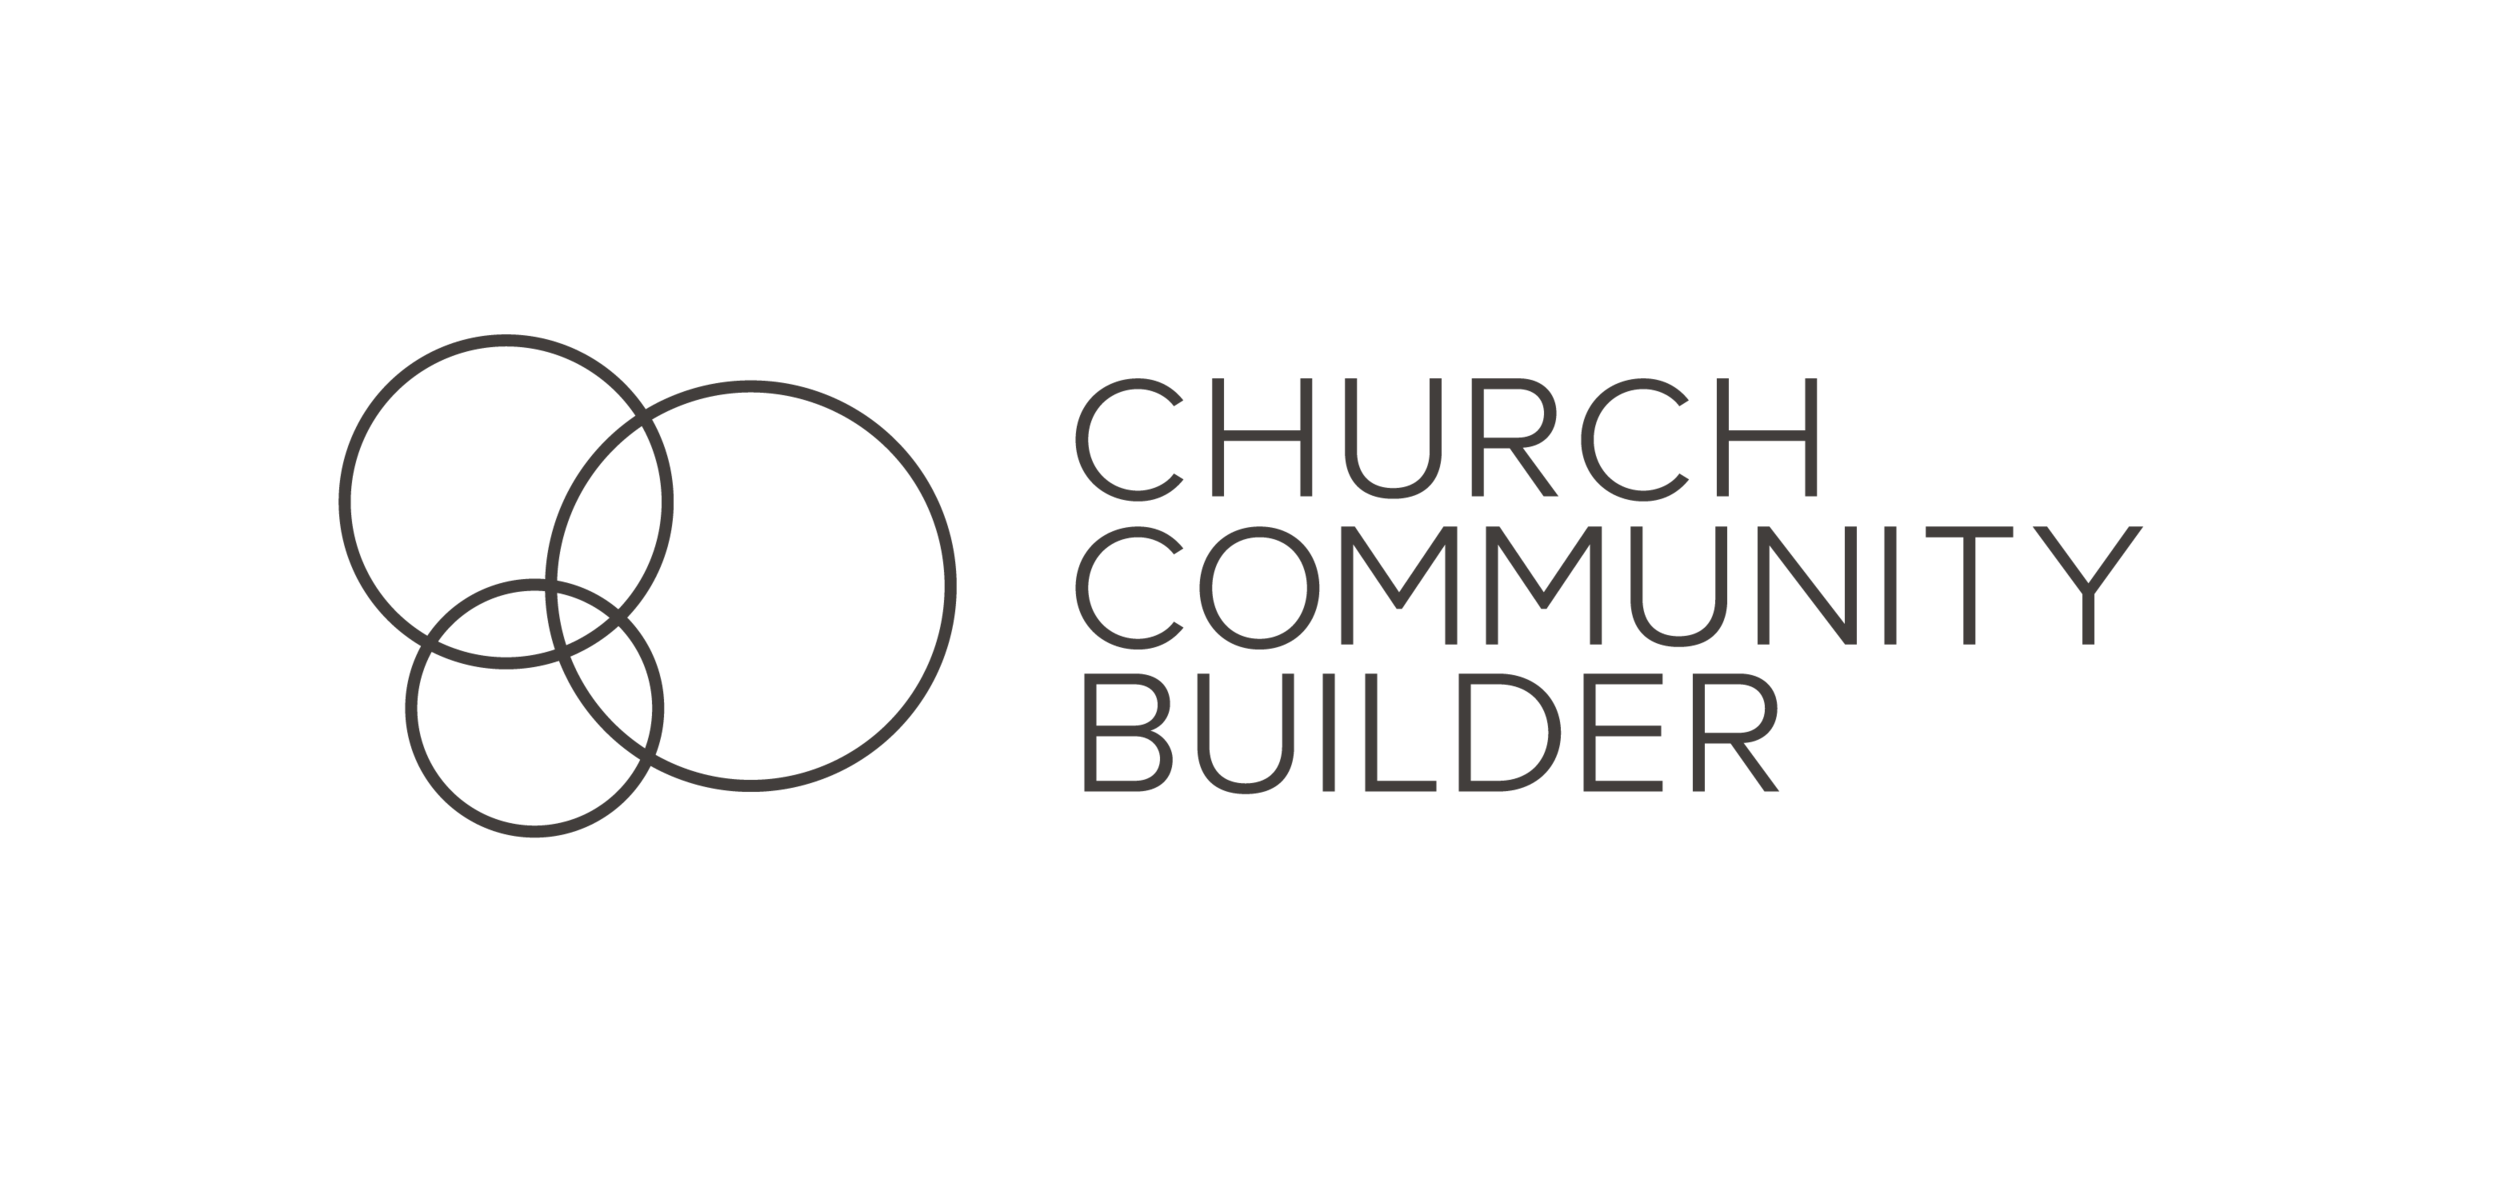 Church_Community_Builder_Logo.png